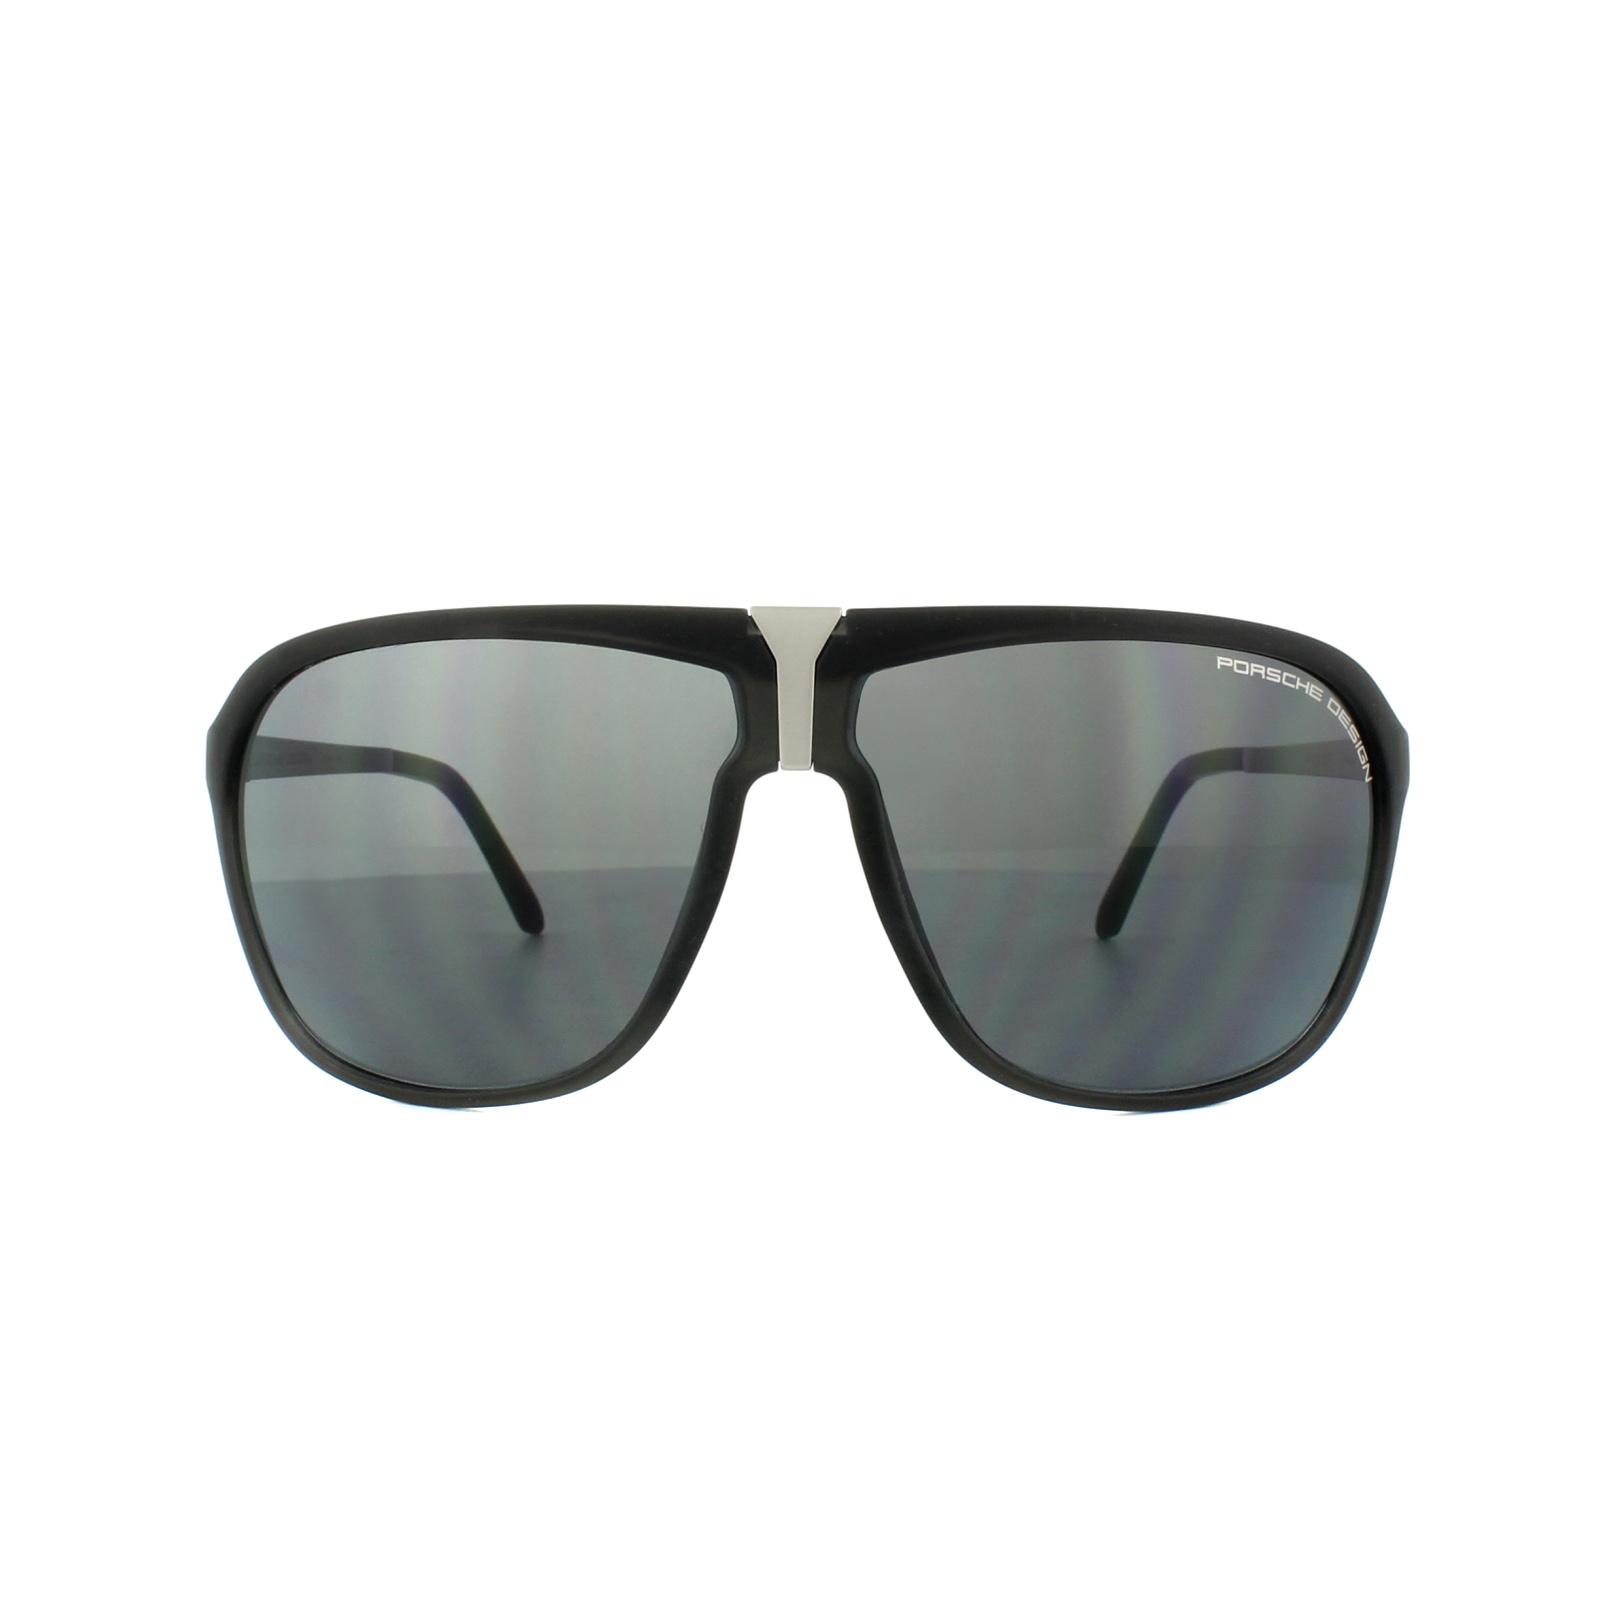 67a55fea47de Porsche Sunglasses Ebay Uk